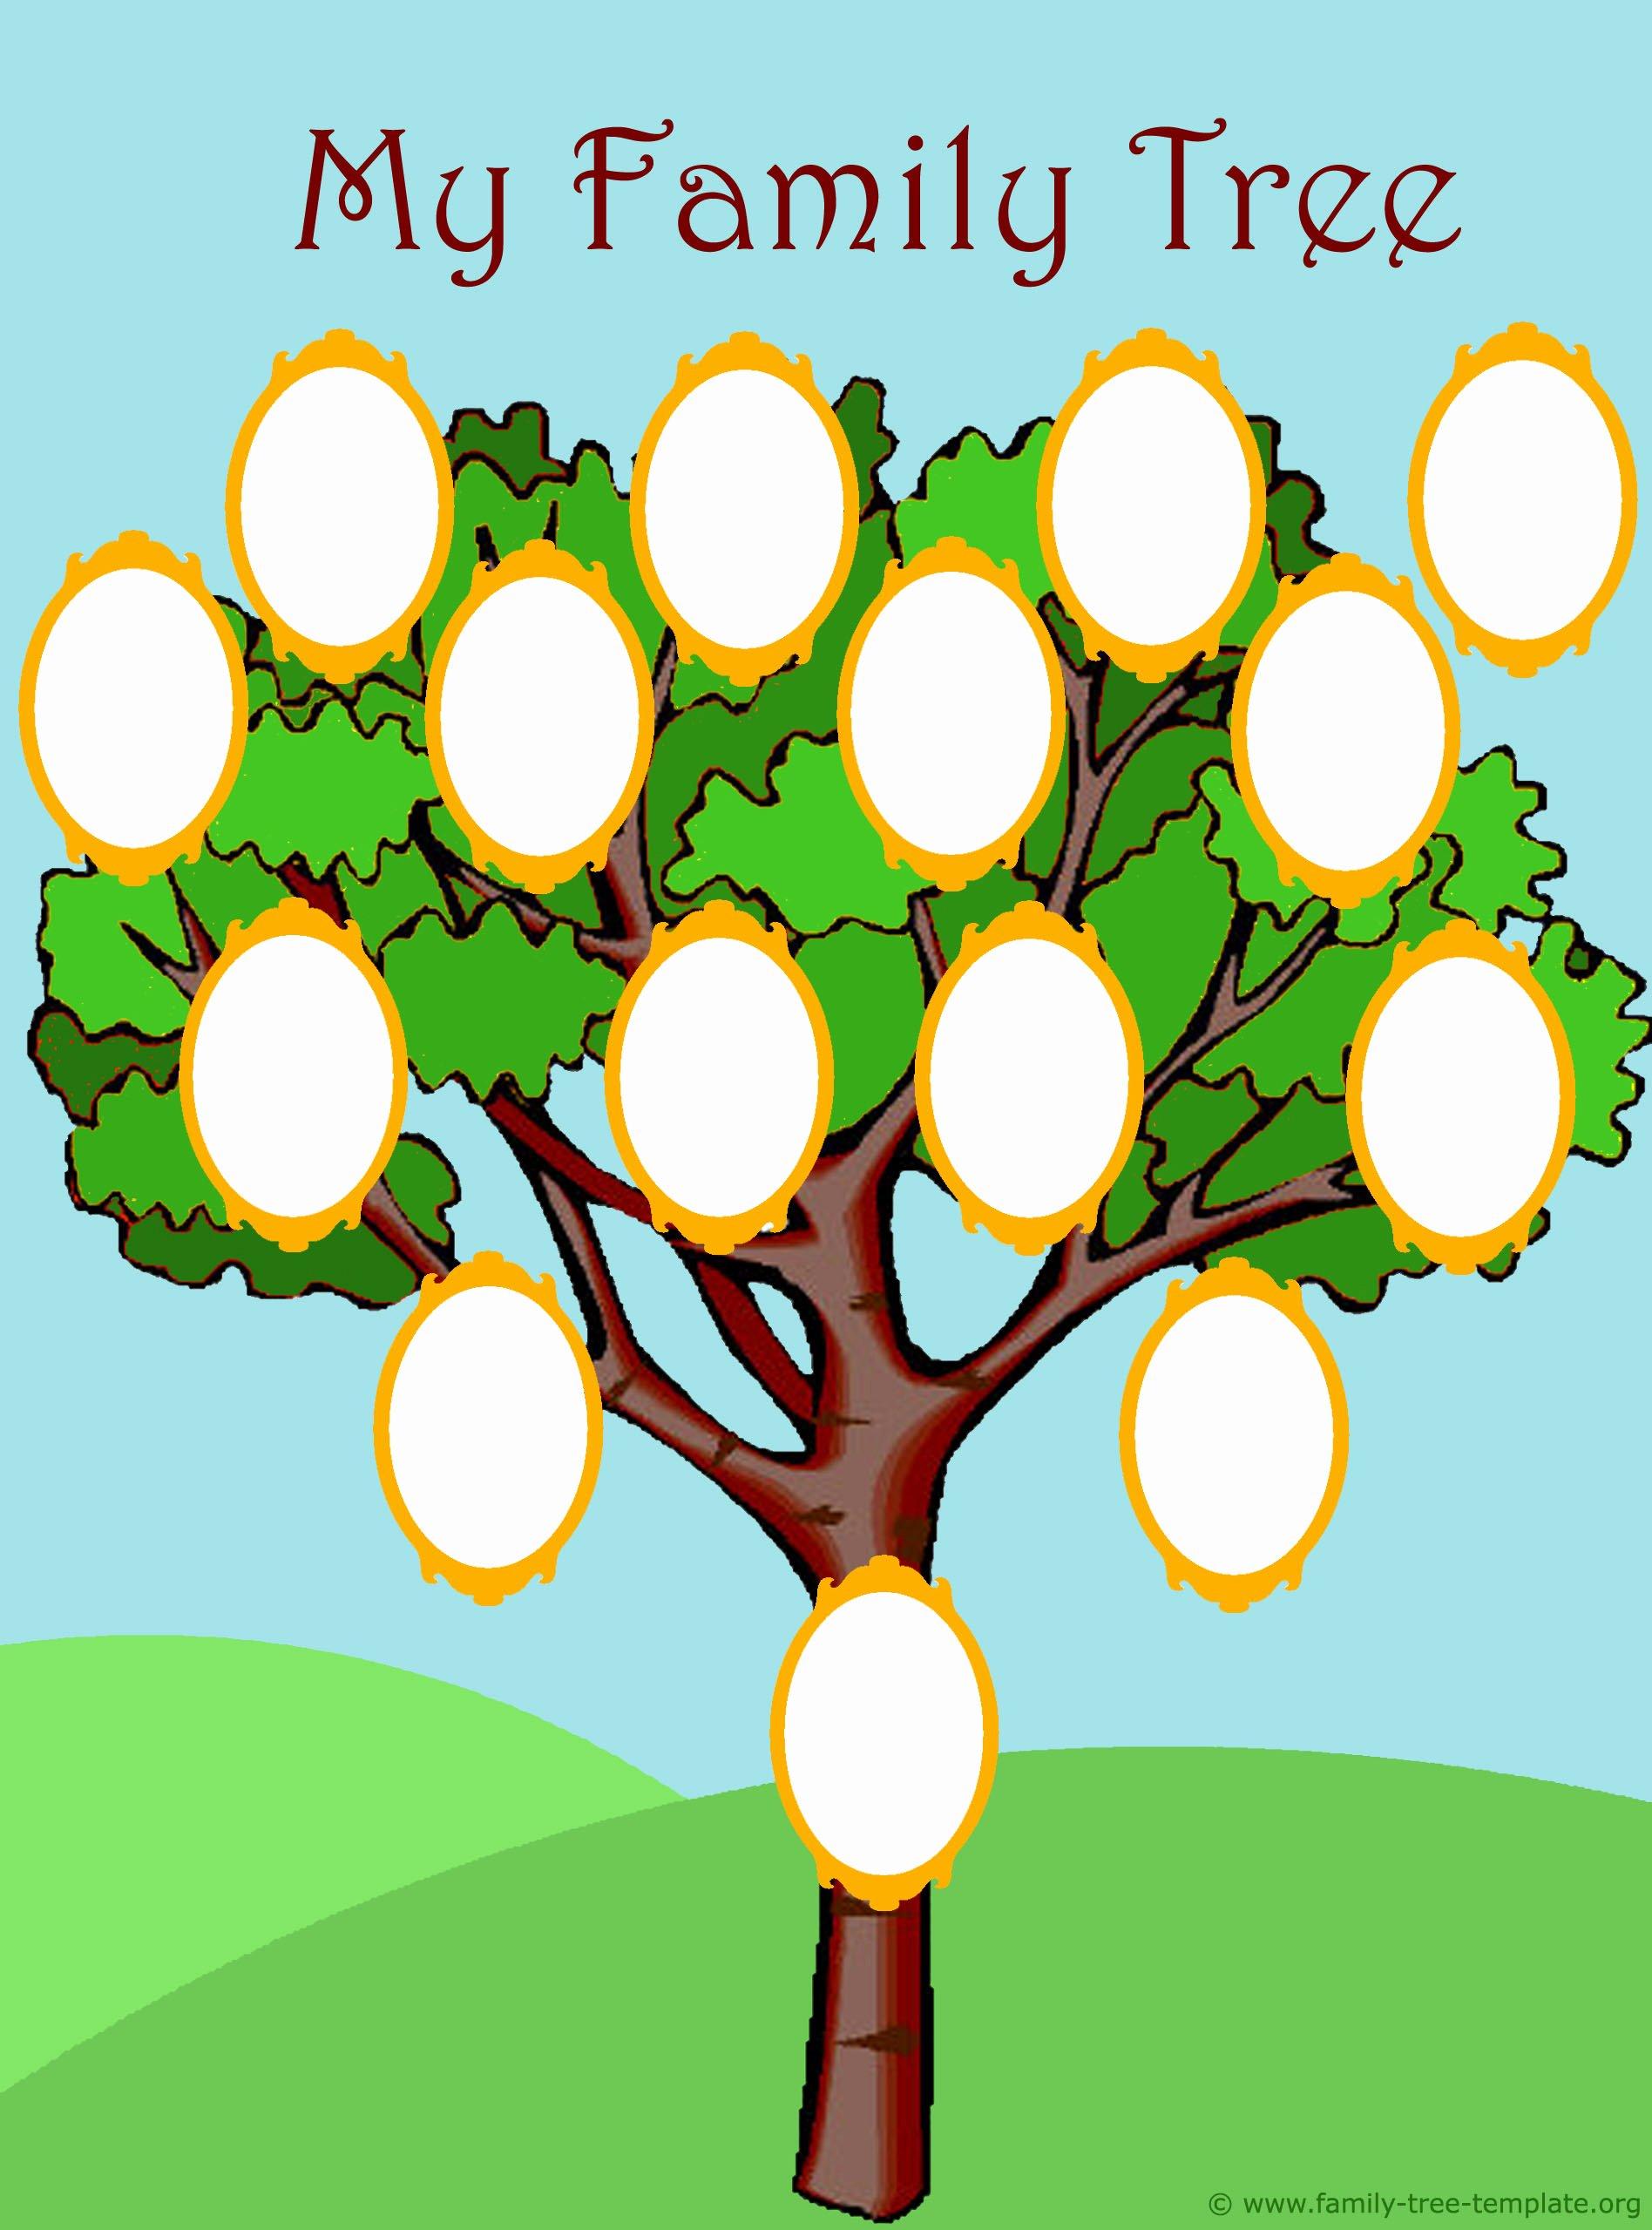 Kindergarten Family Tree Template Lovely Family Tree Freebies – Gianna the Great